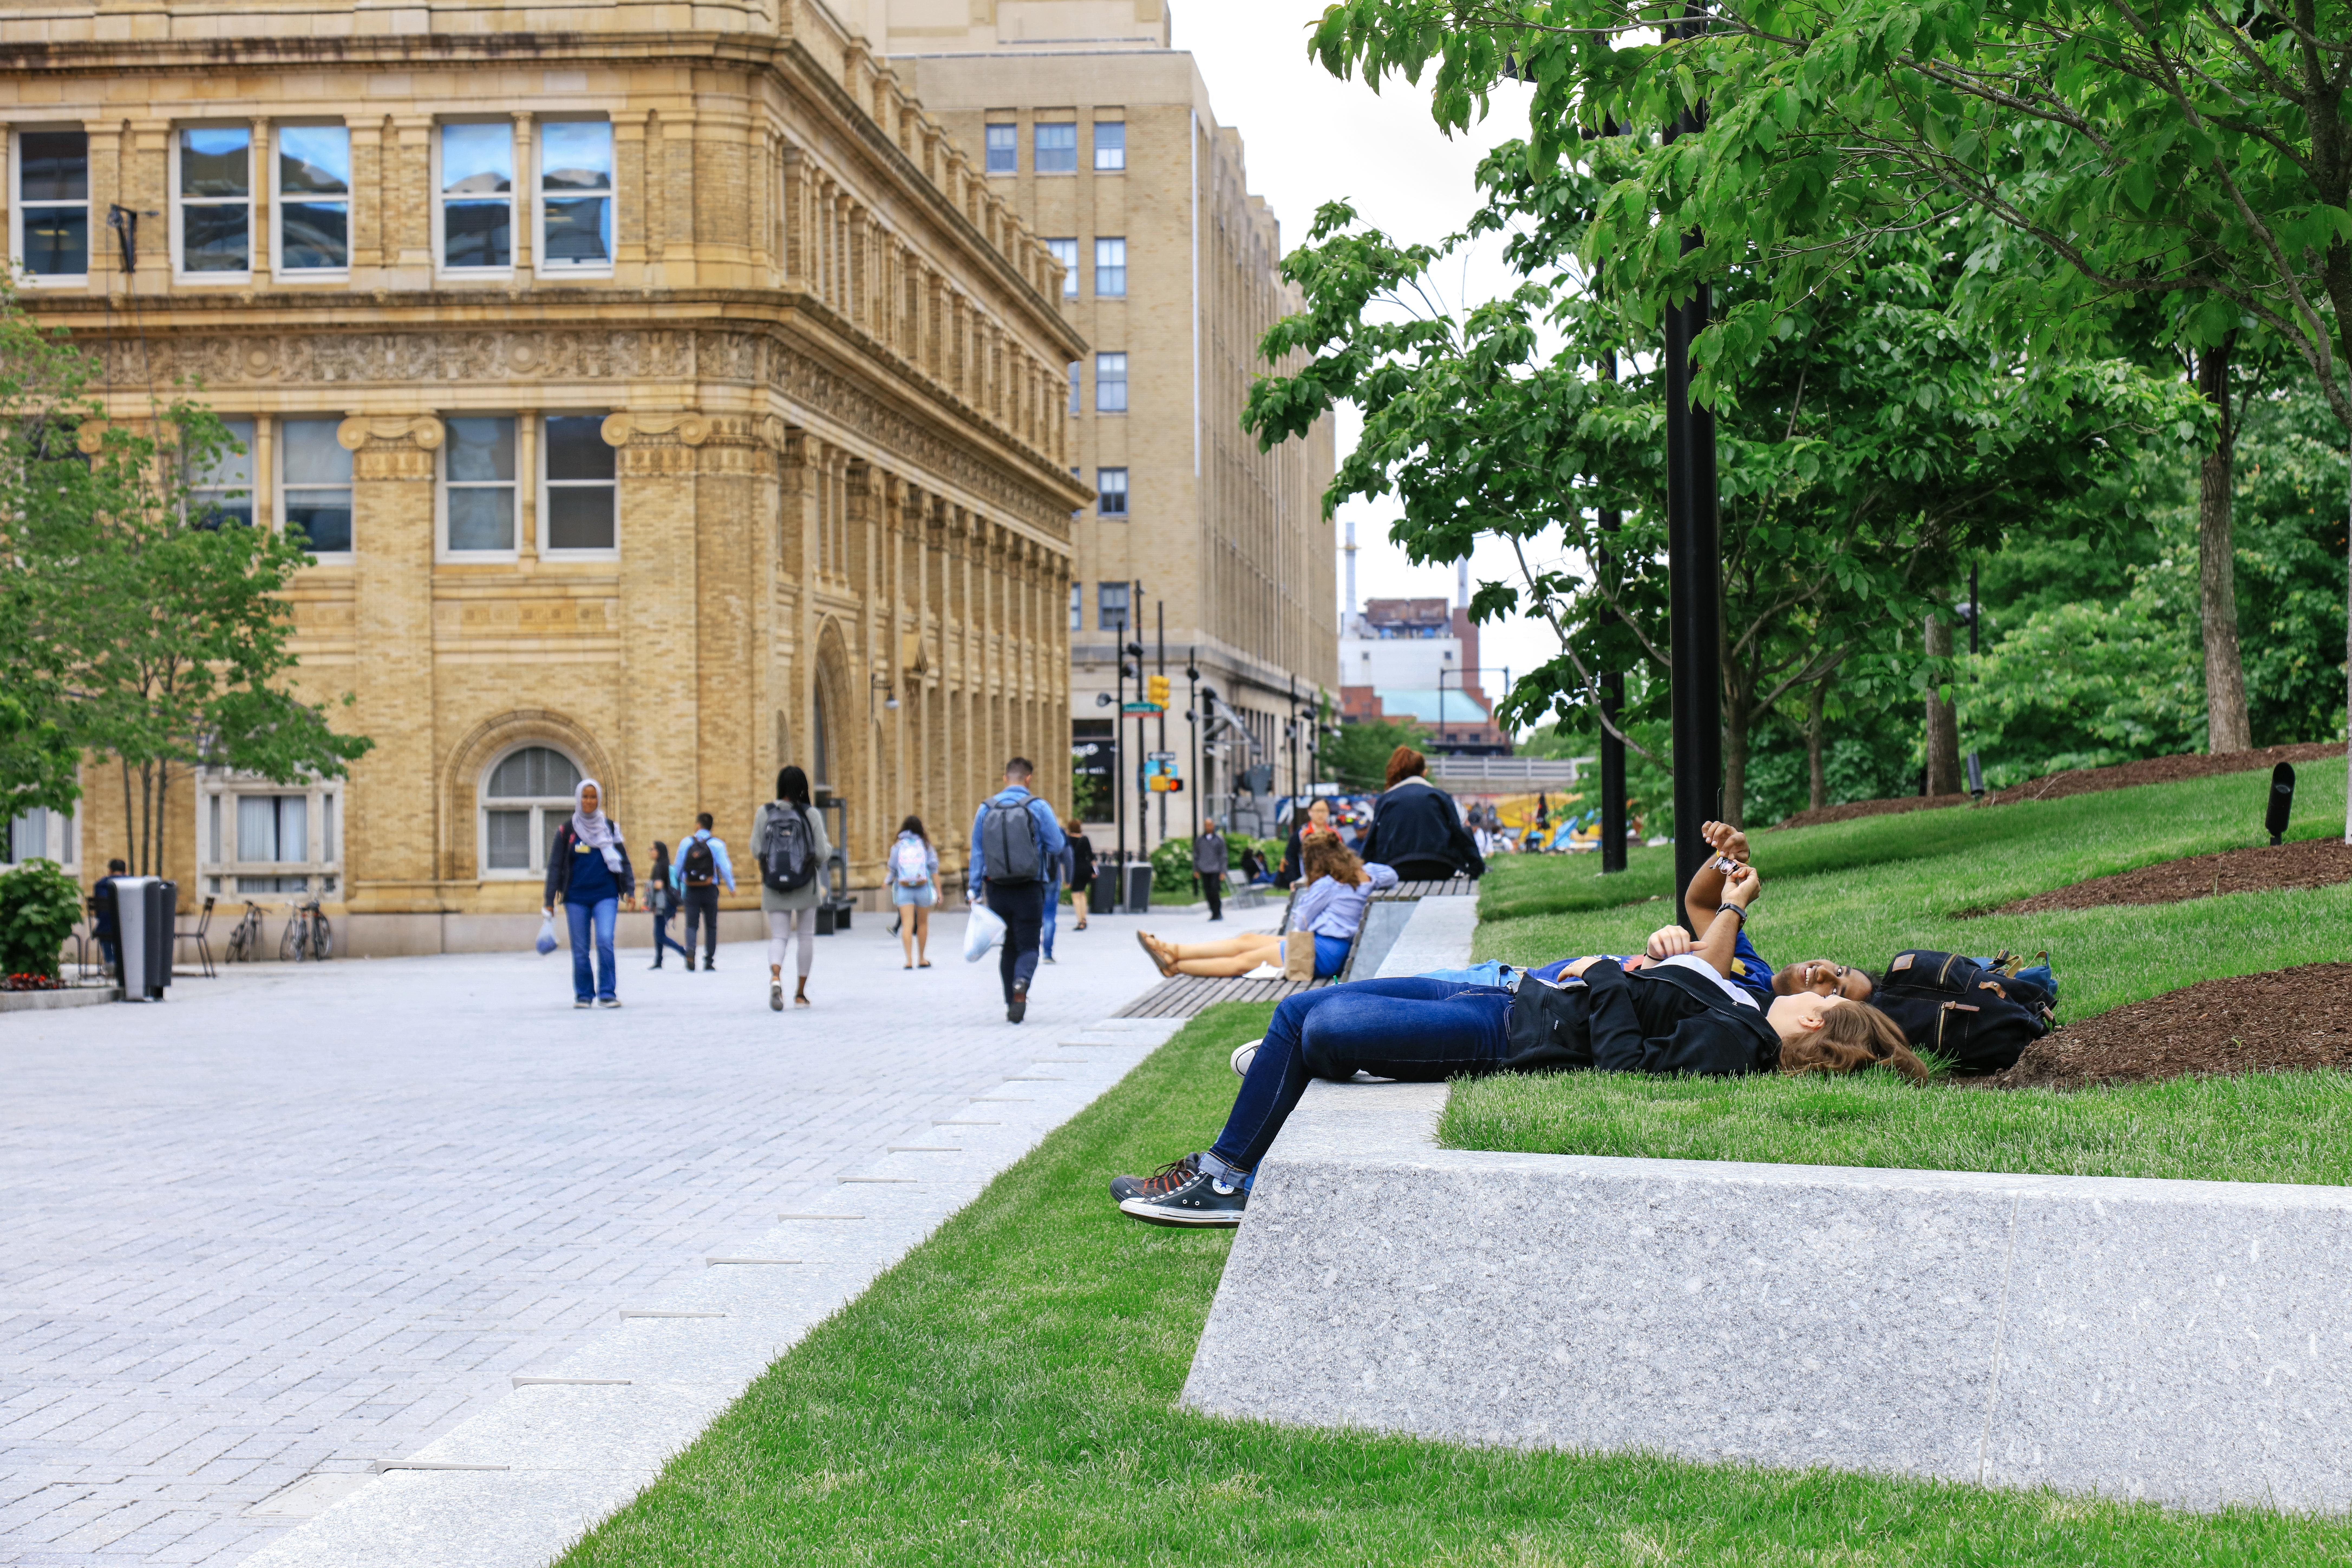 Drexel University - Campus Core (Korman Quadrangle and Perelman Plaza)